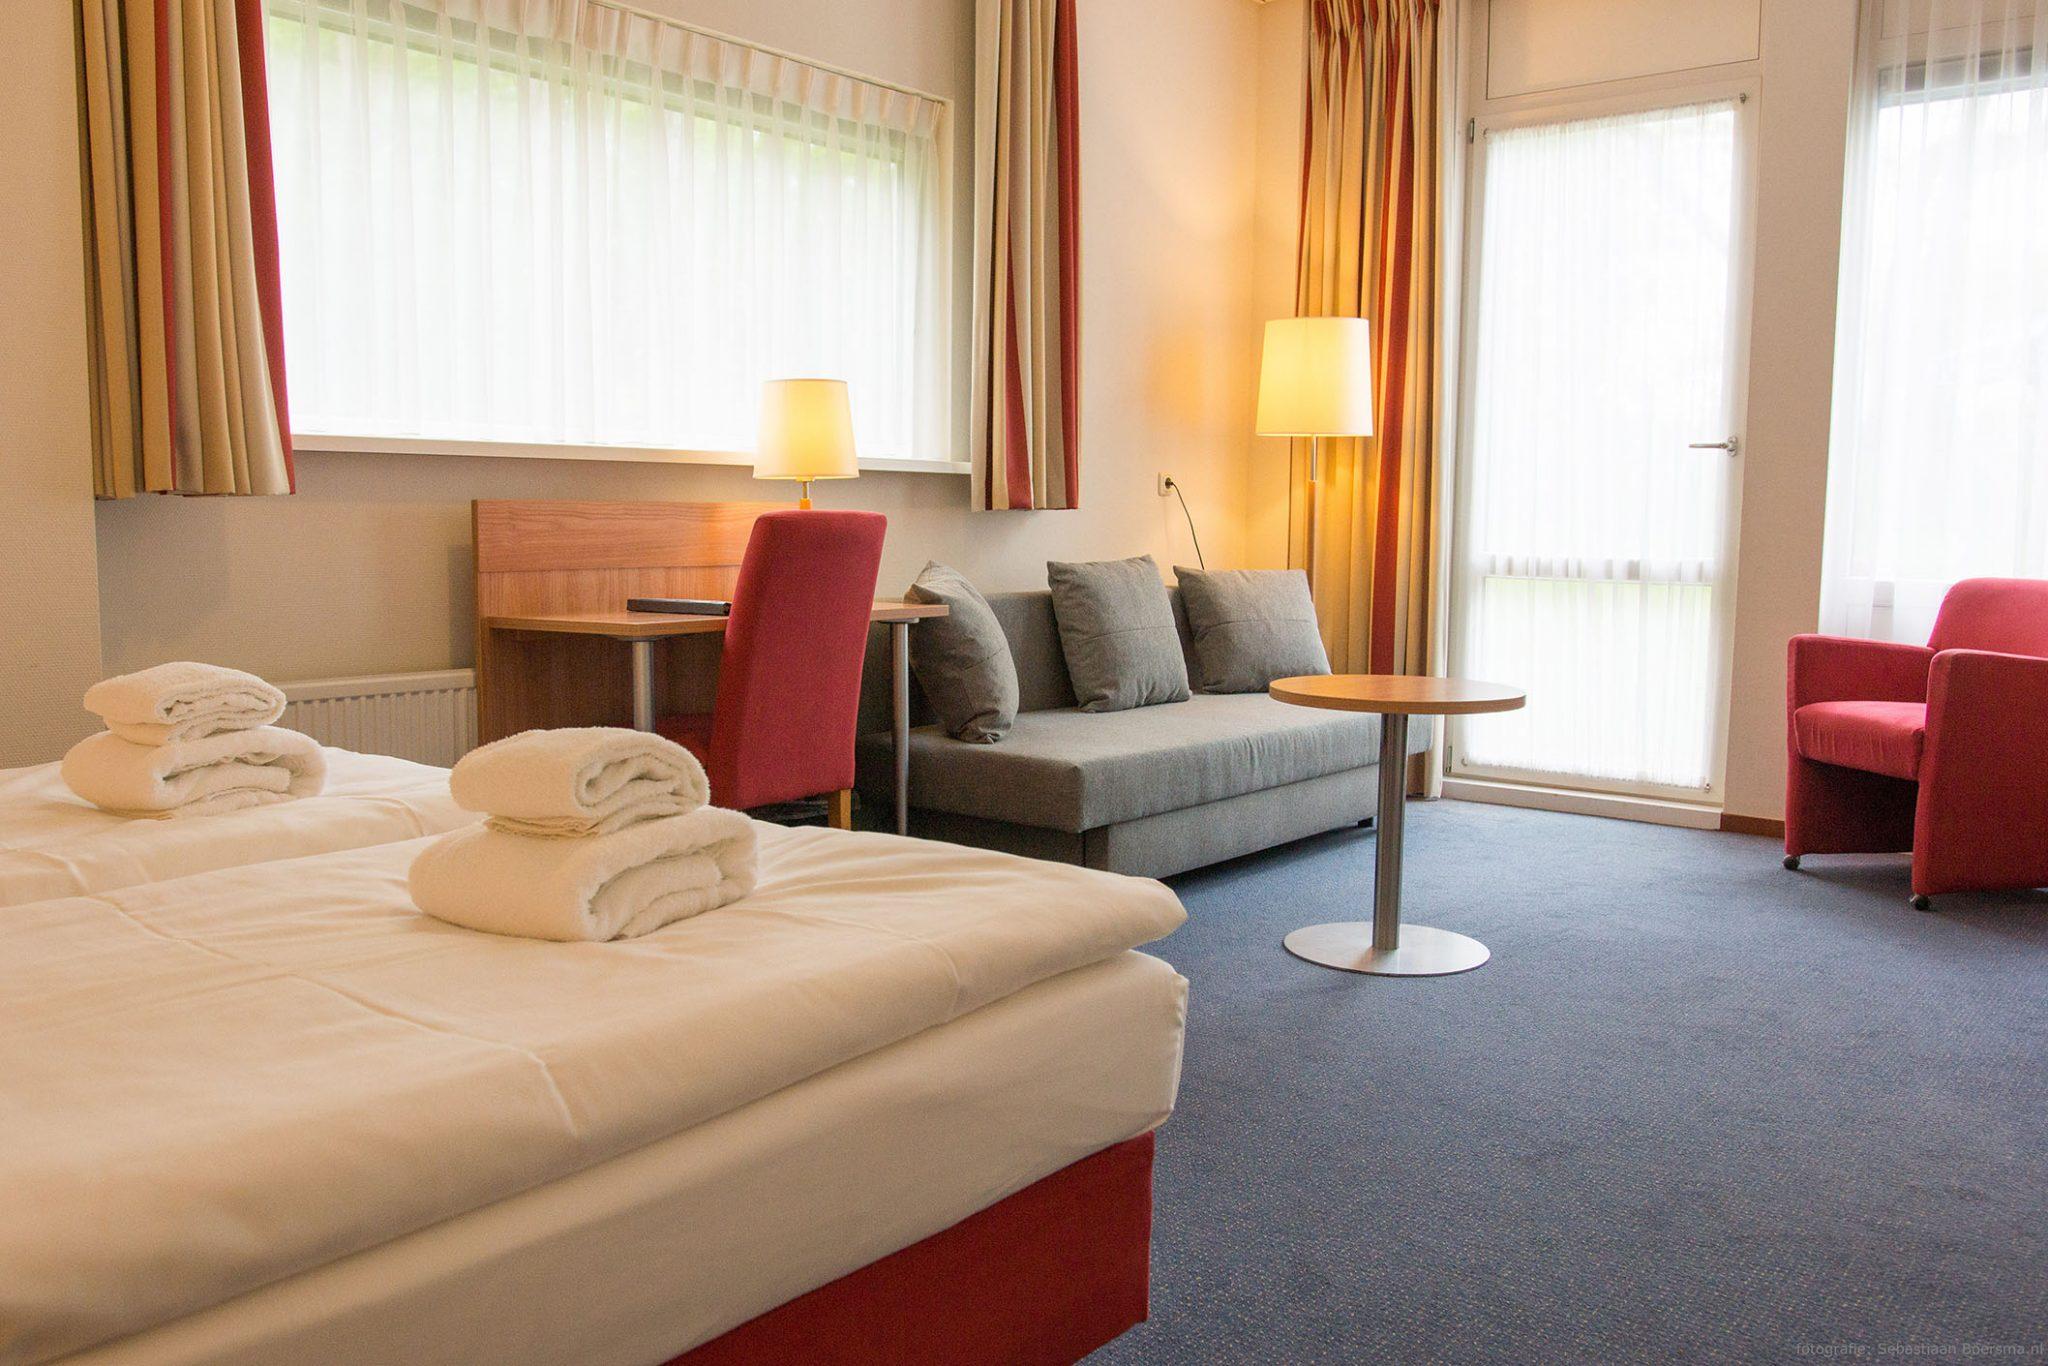 Hotelkamers hotel de stoppelberg - Kamer klein bad ...